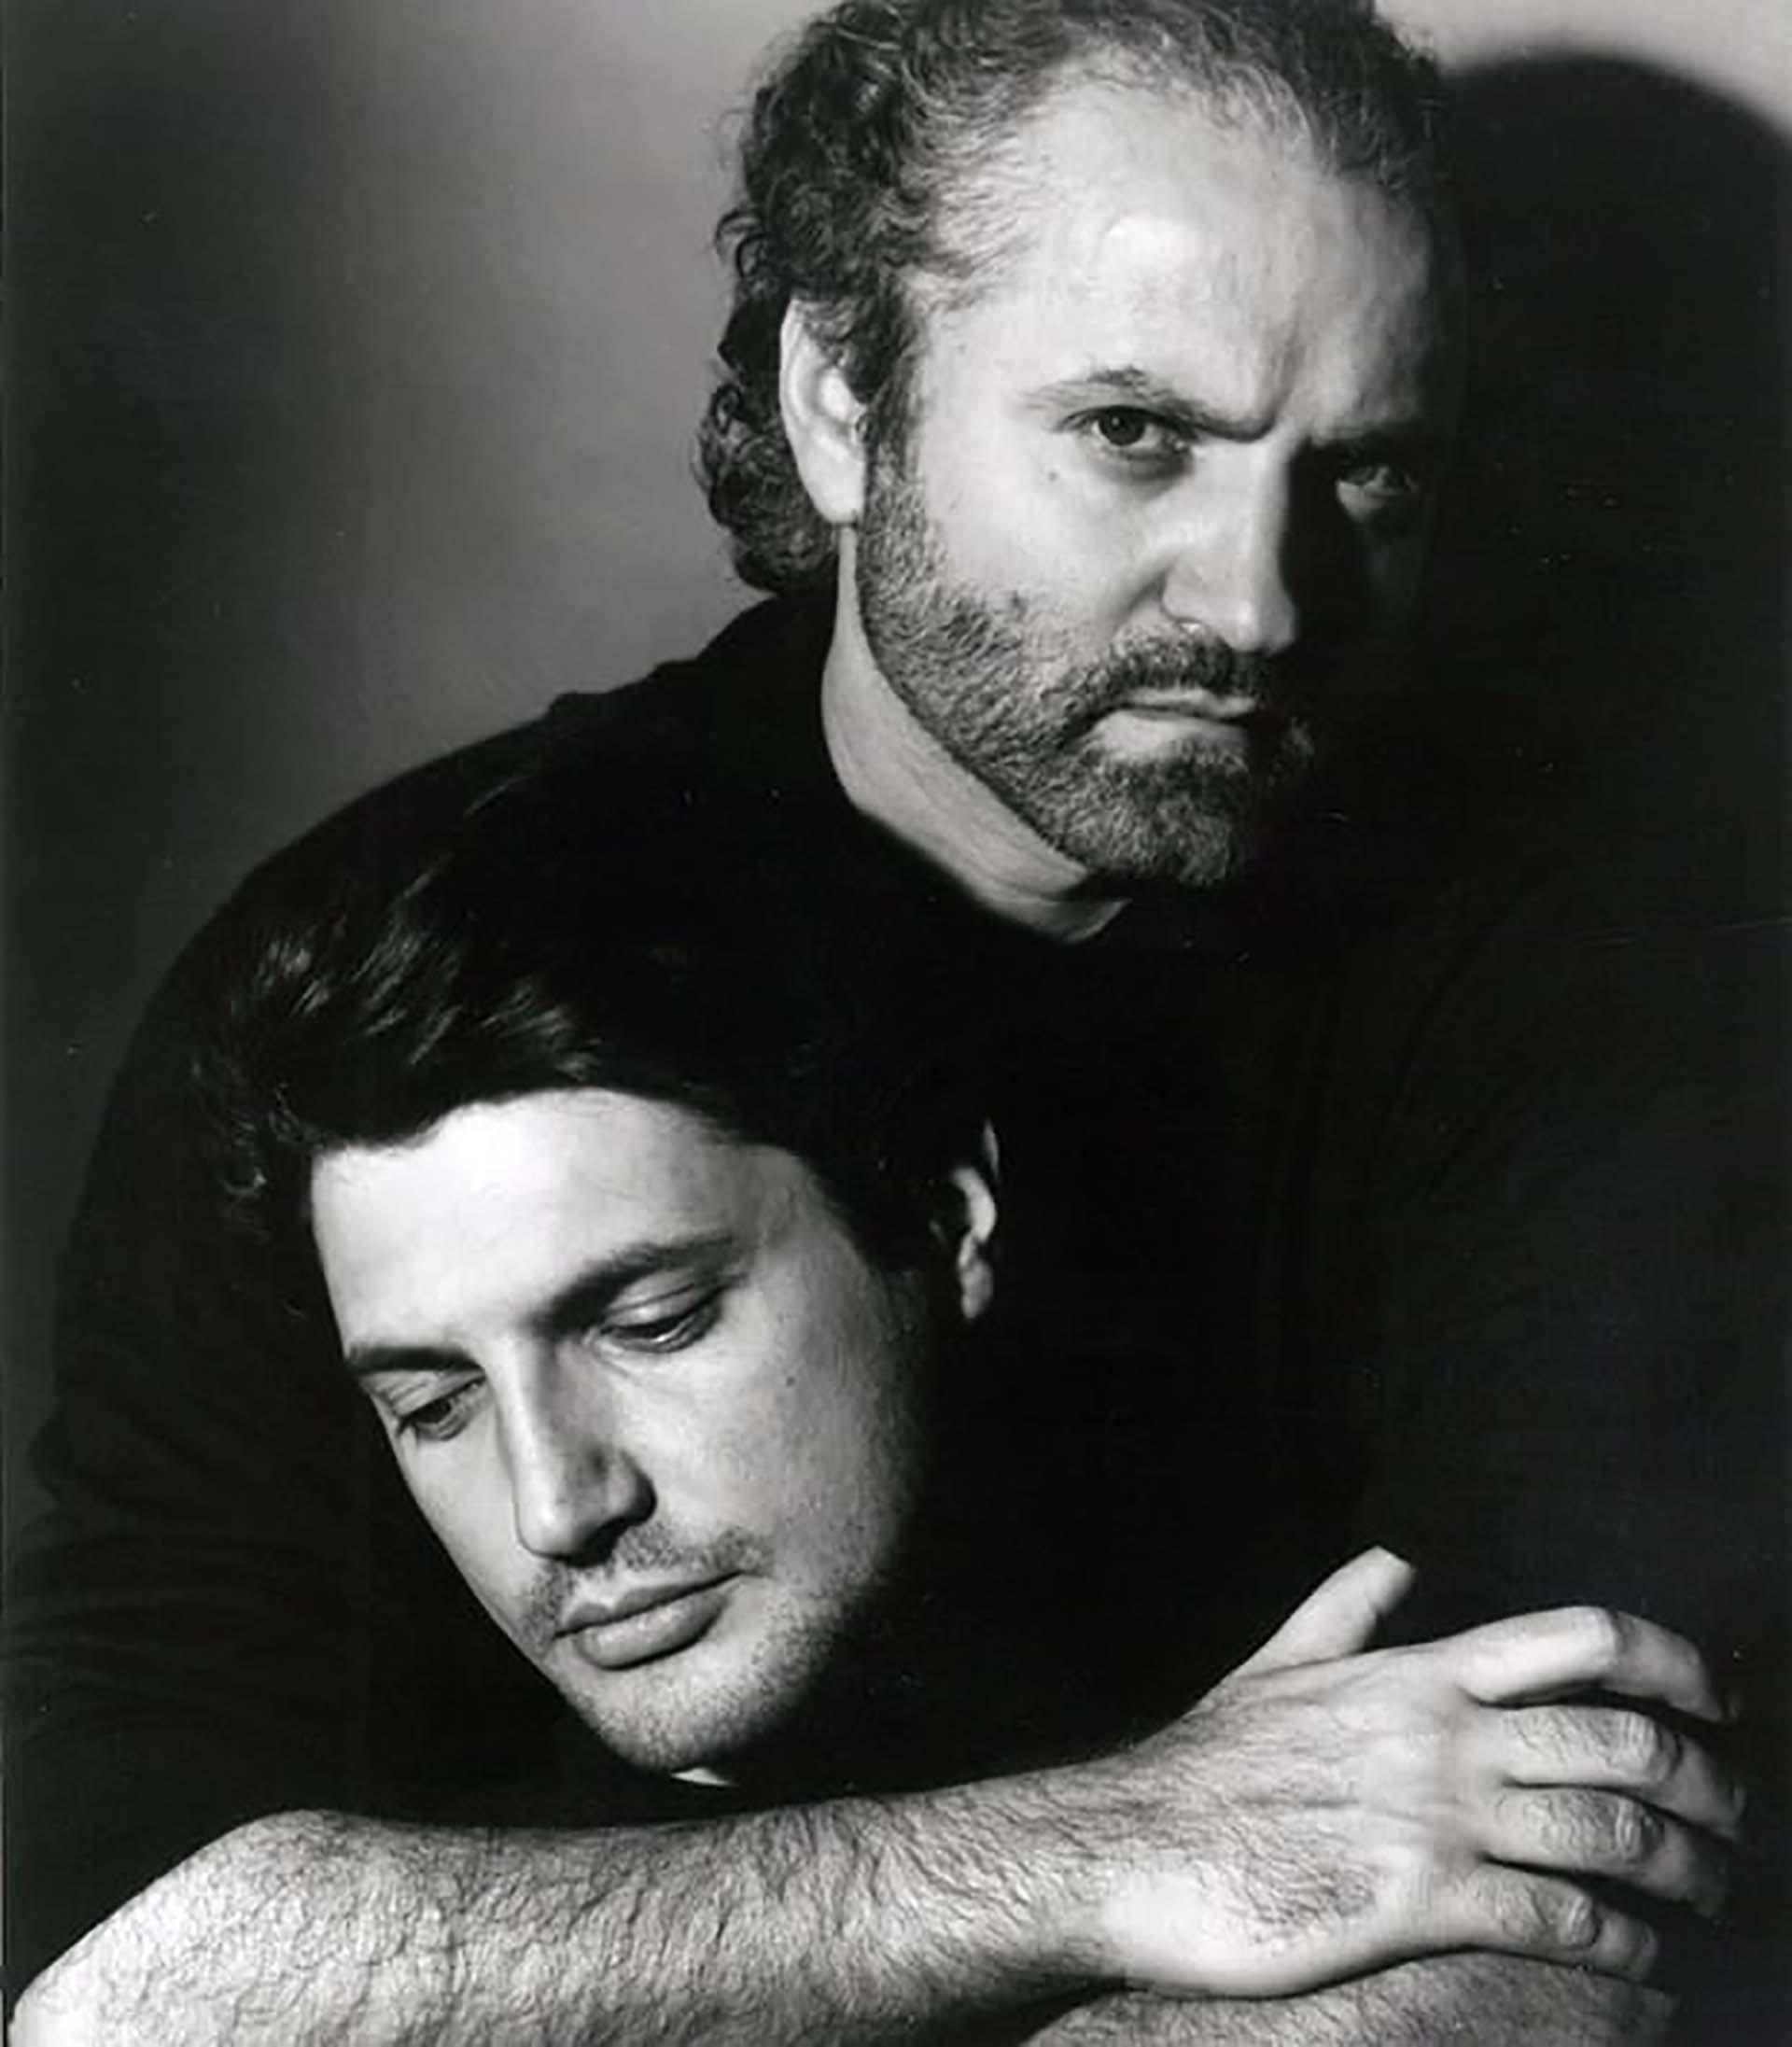 Antonio D'Amico con Gianni Versace